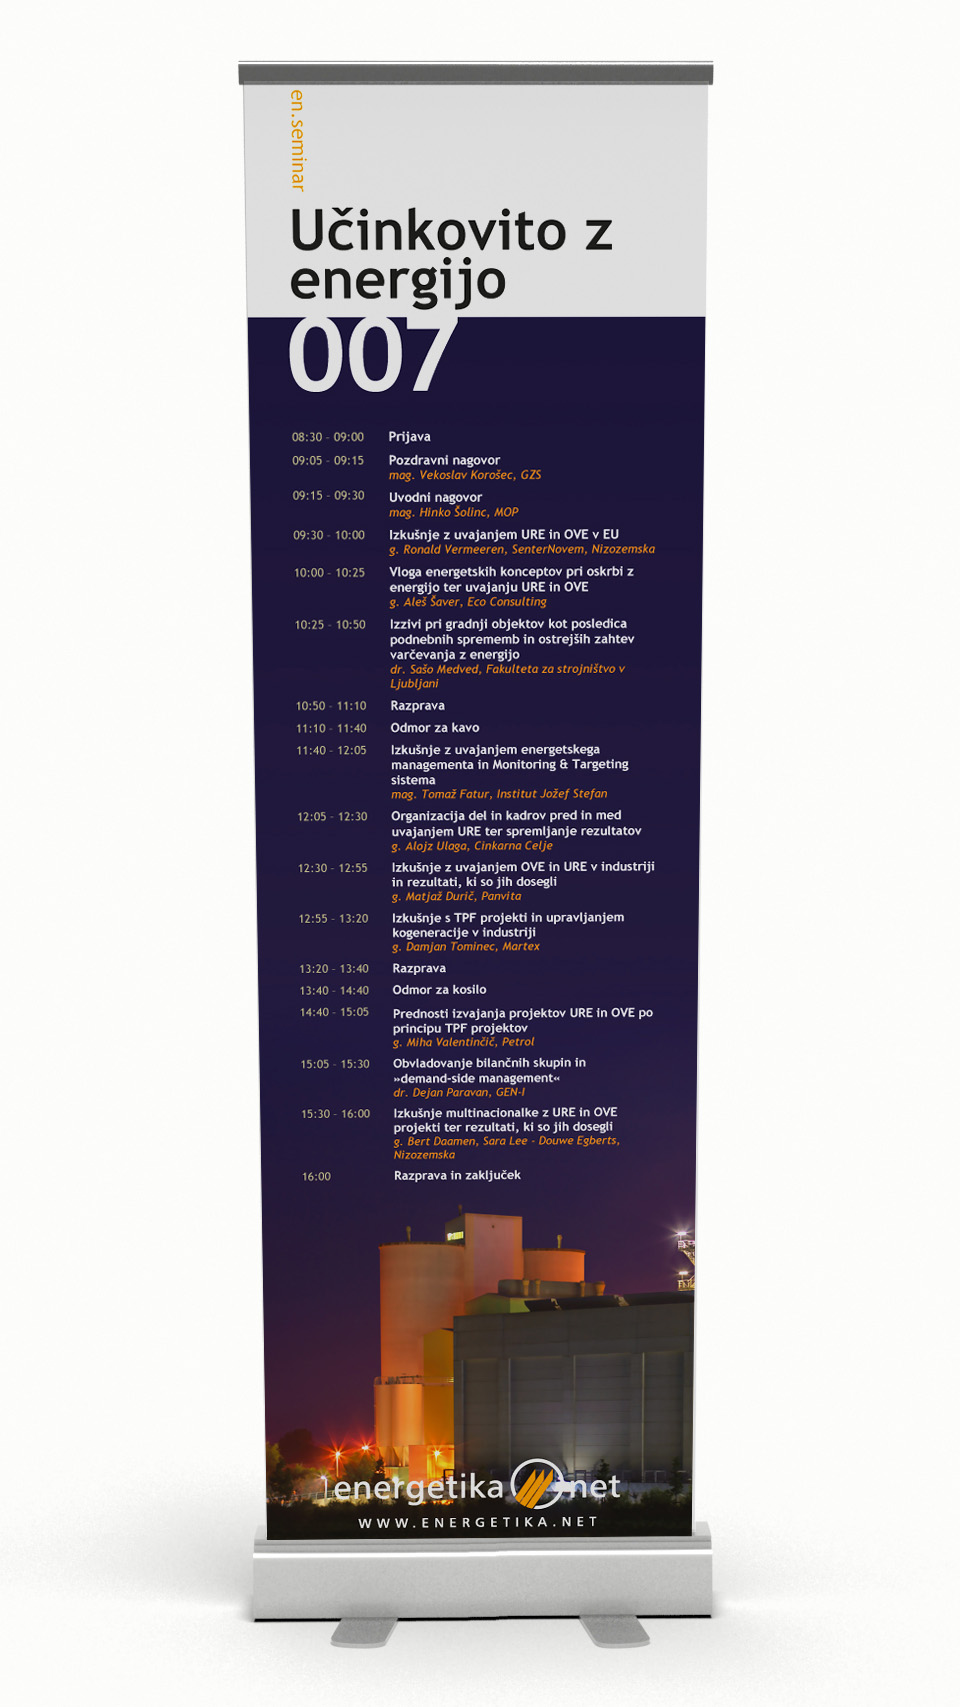 Energetika.NET 007 seminar roll-up banner